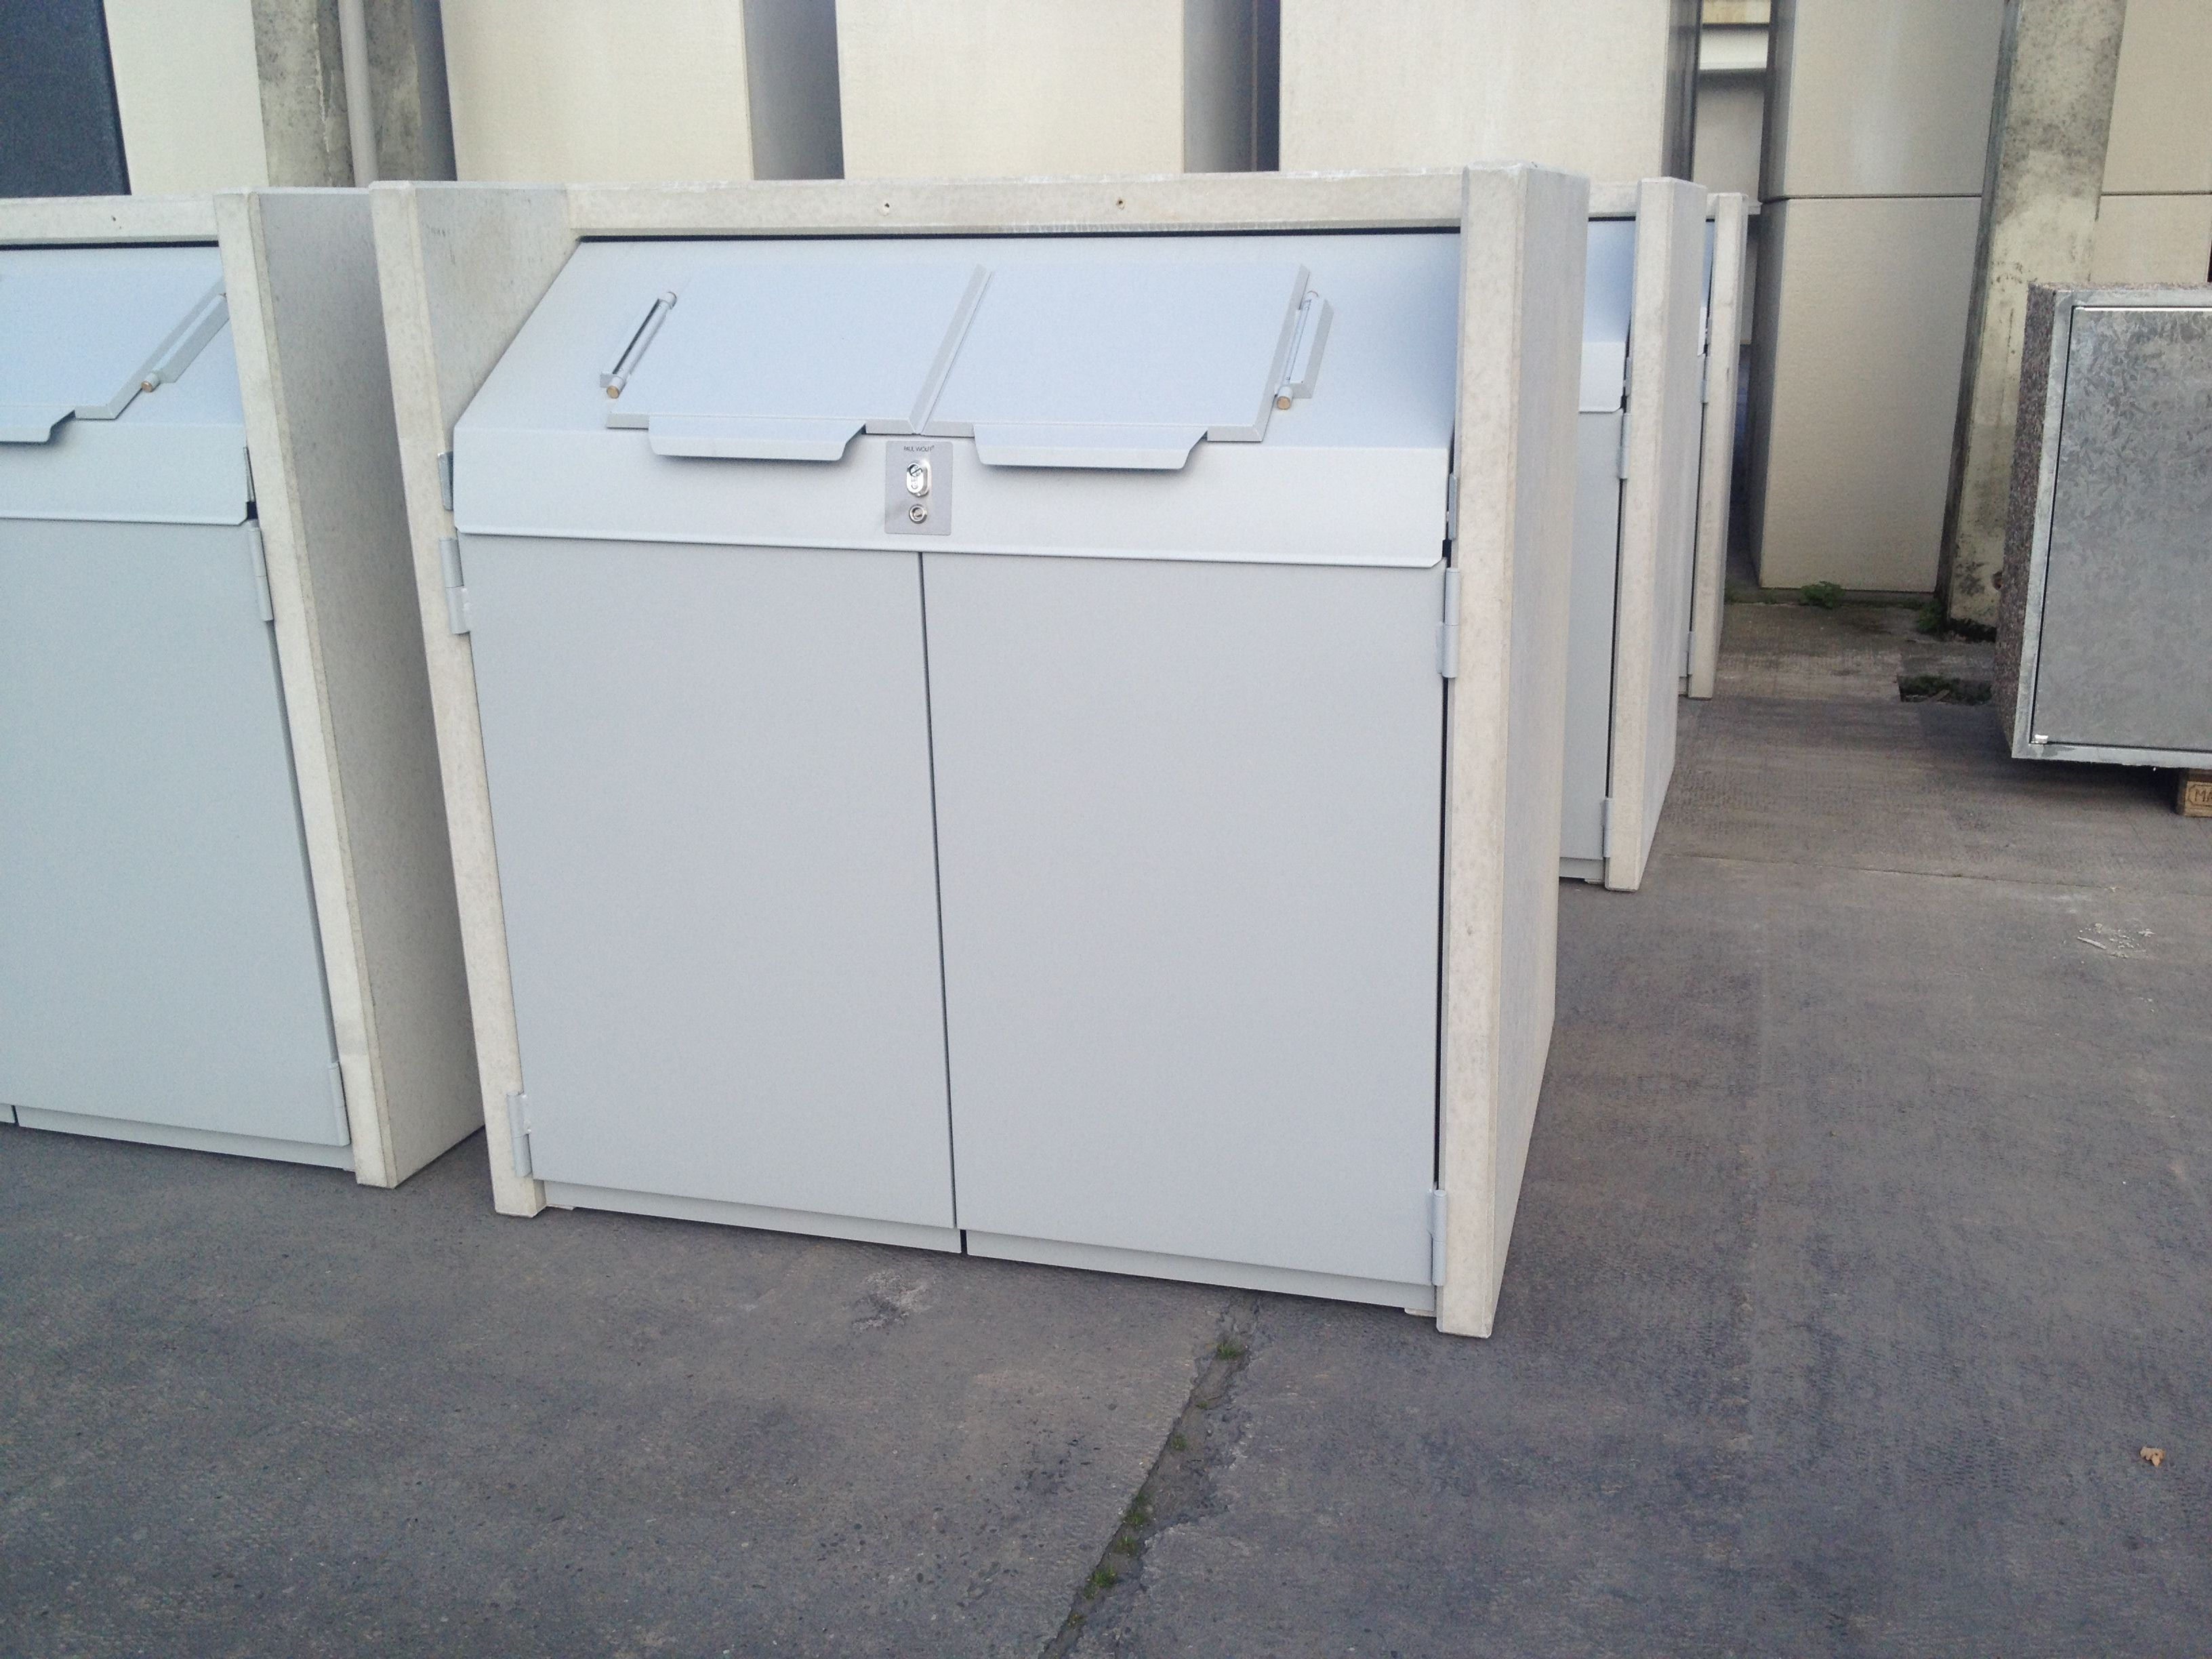 Mülltonnenbox SILENT 242 Corpus eisgrau Türen taupe violett